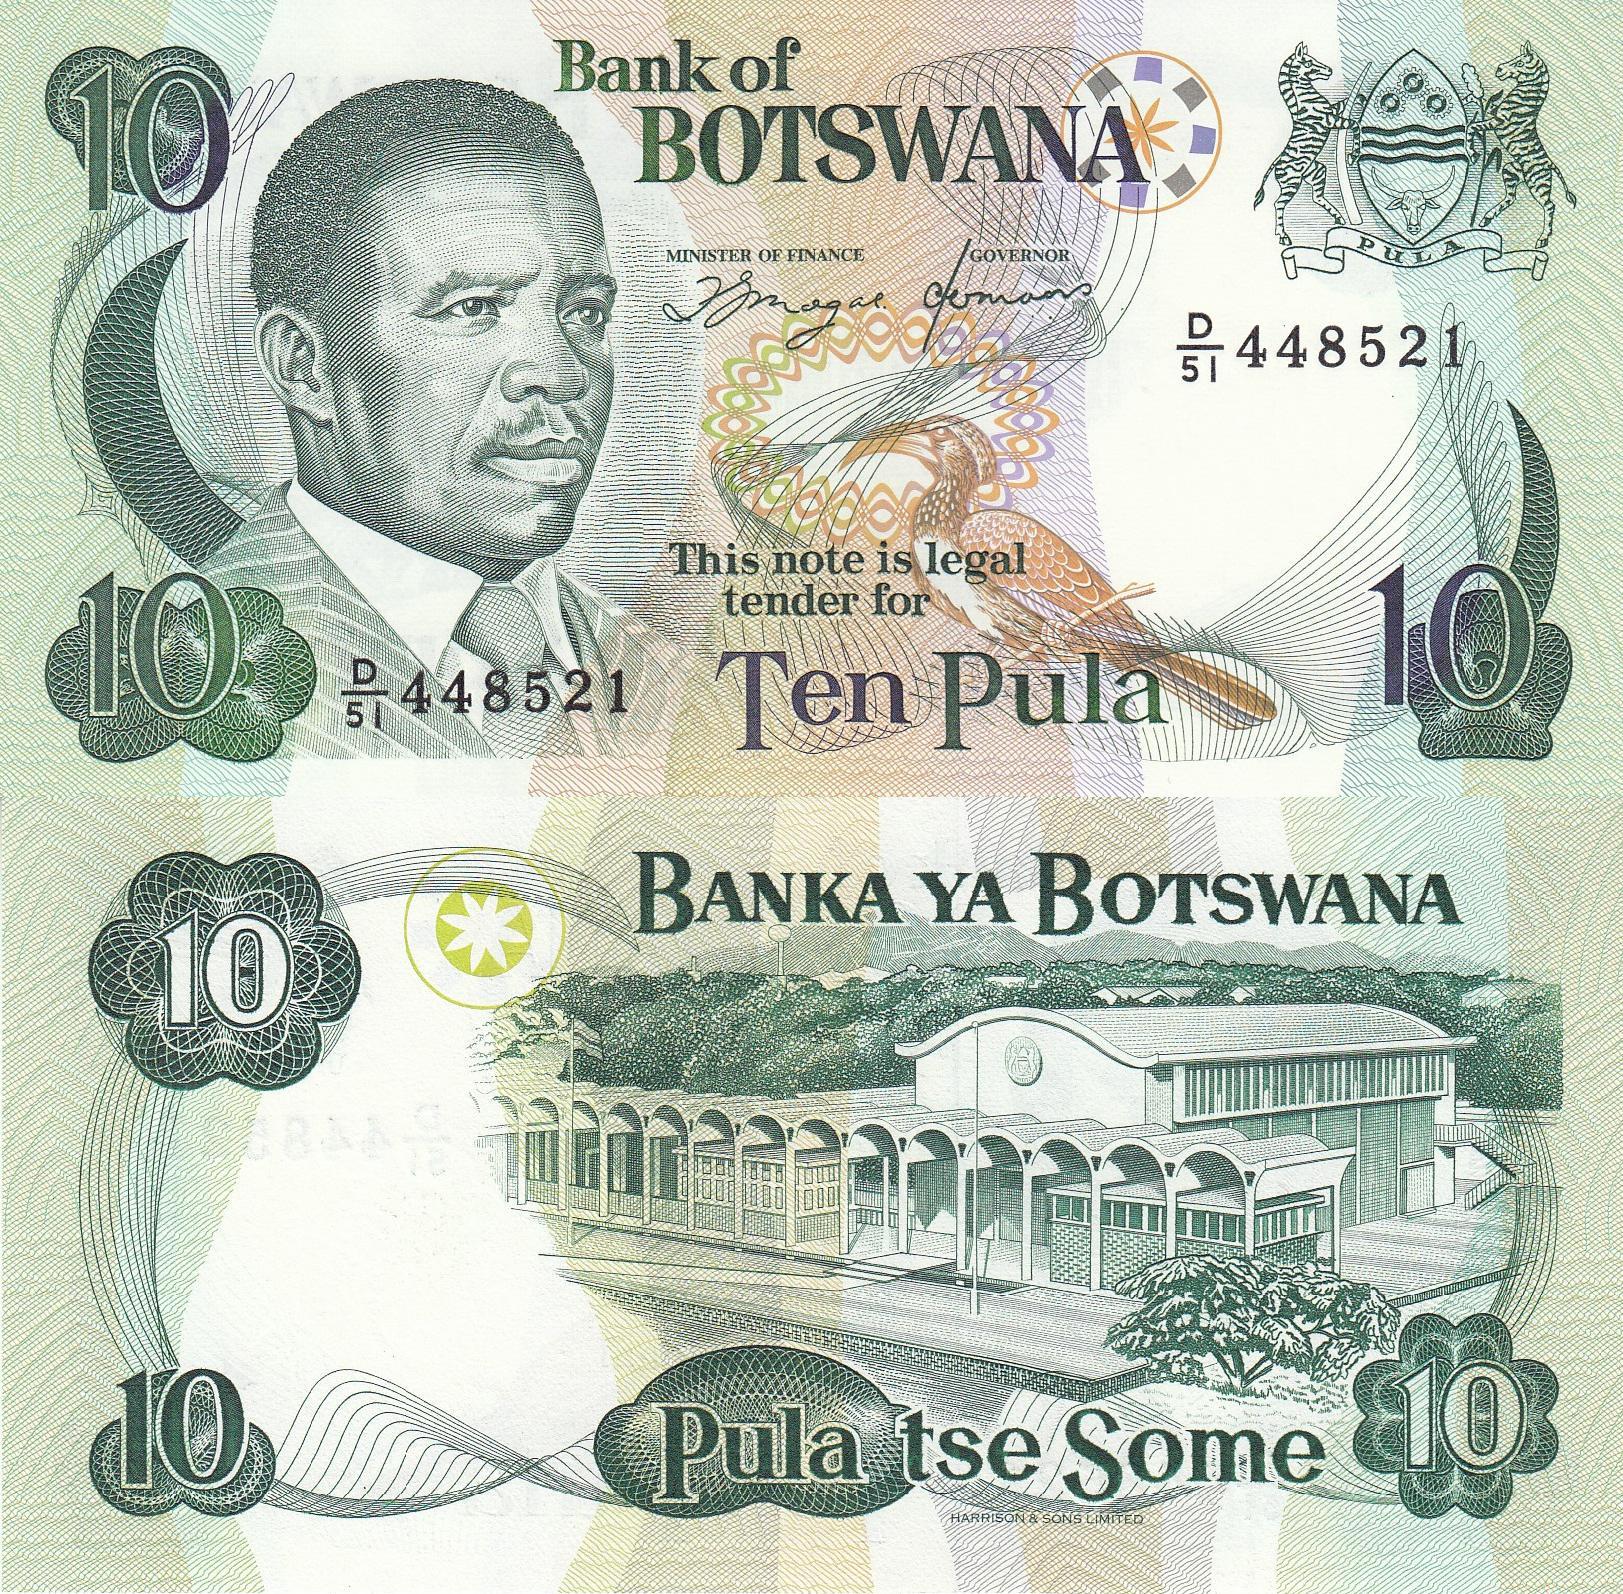 BOTSWANA Africa 10 Pula UNC 1992 p-12